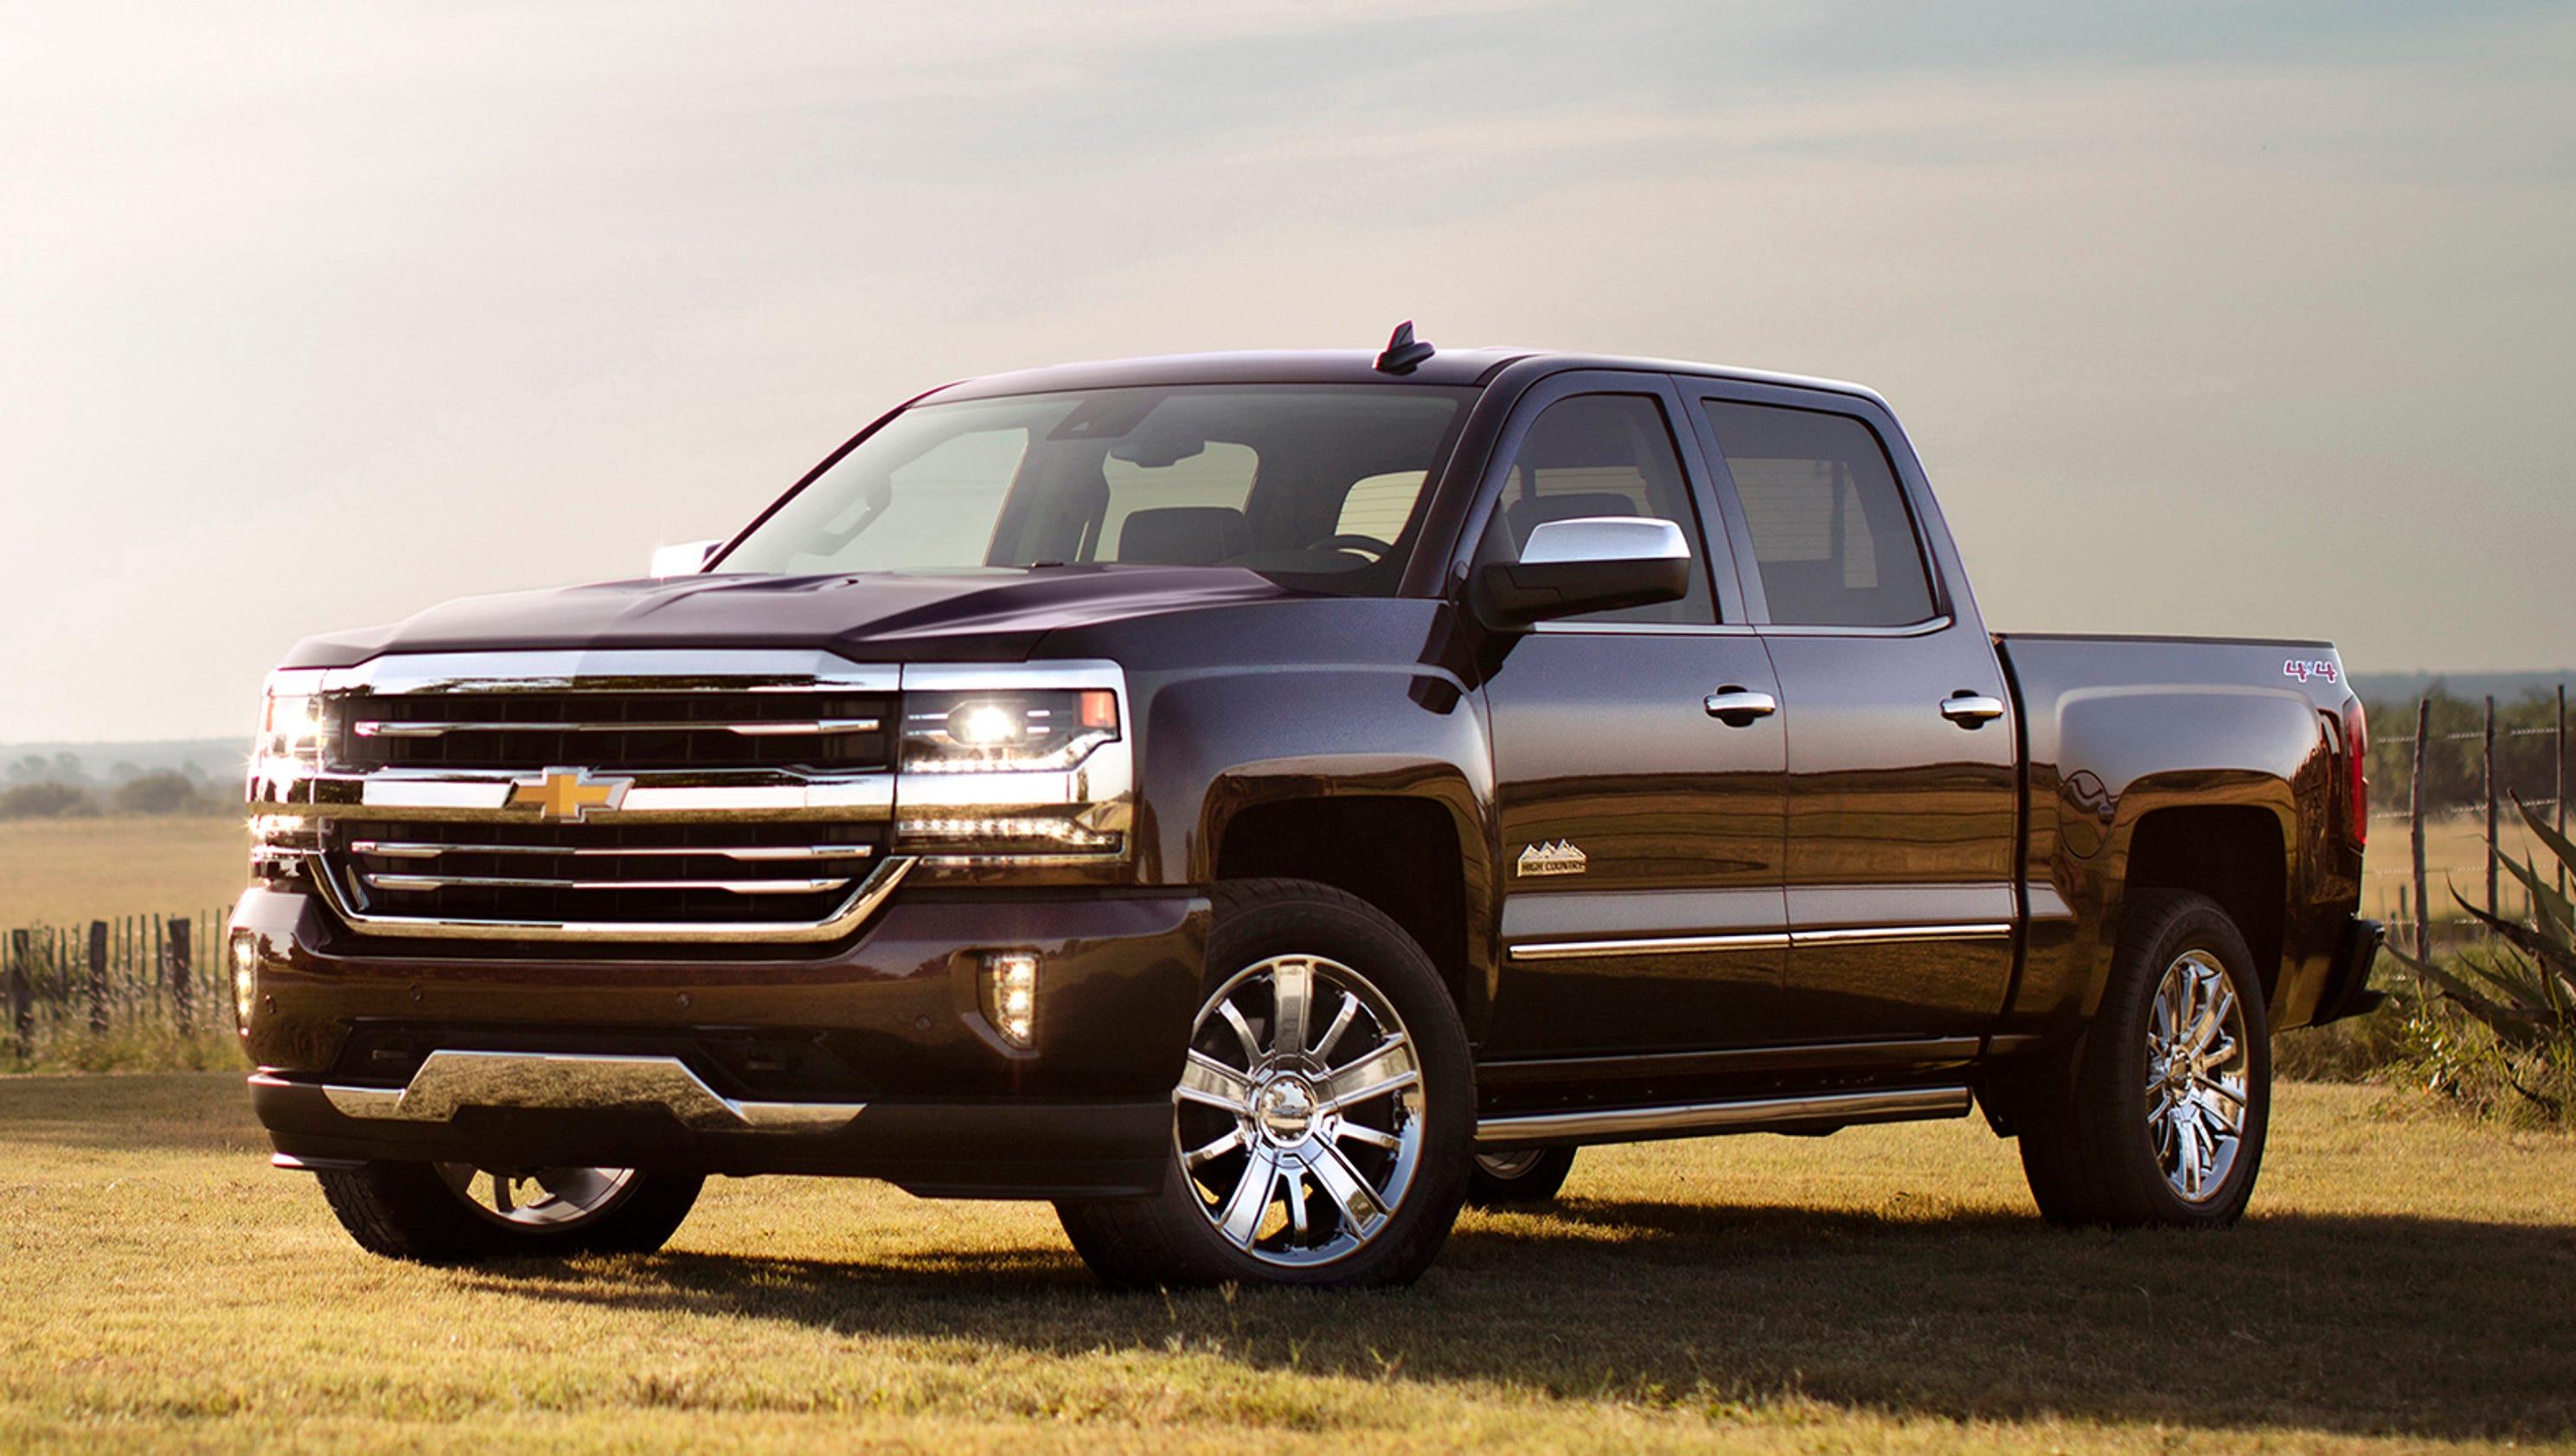 Chevrolet trucks now have a century as General Motors\' backbone